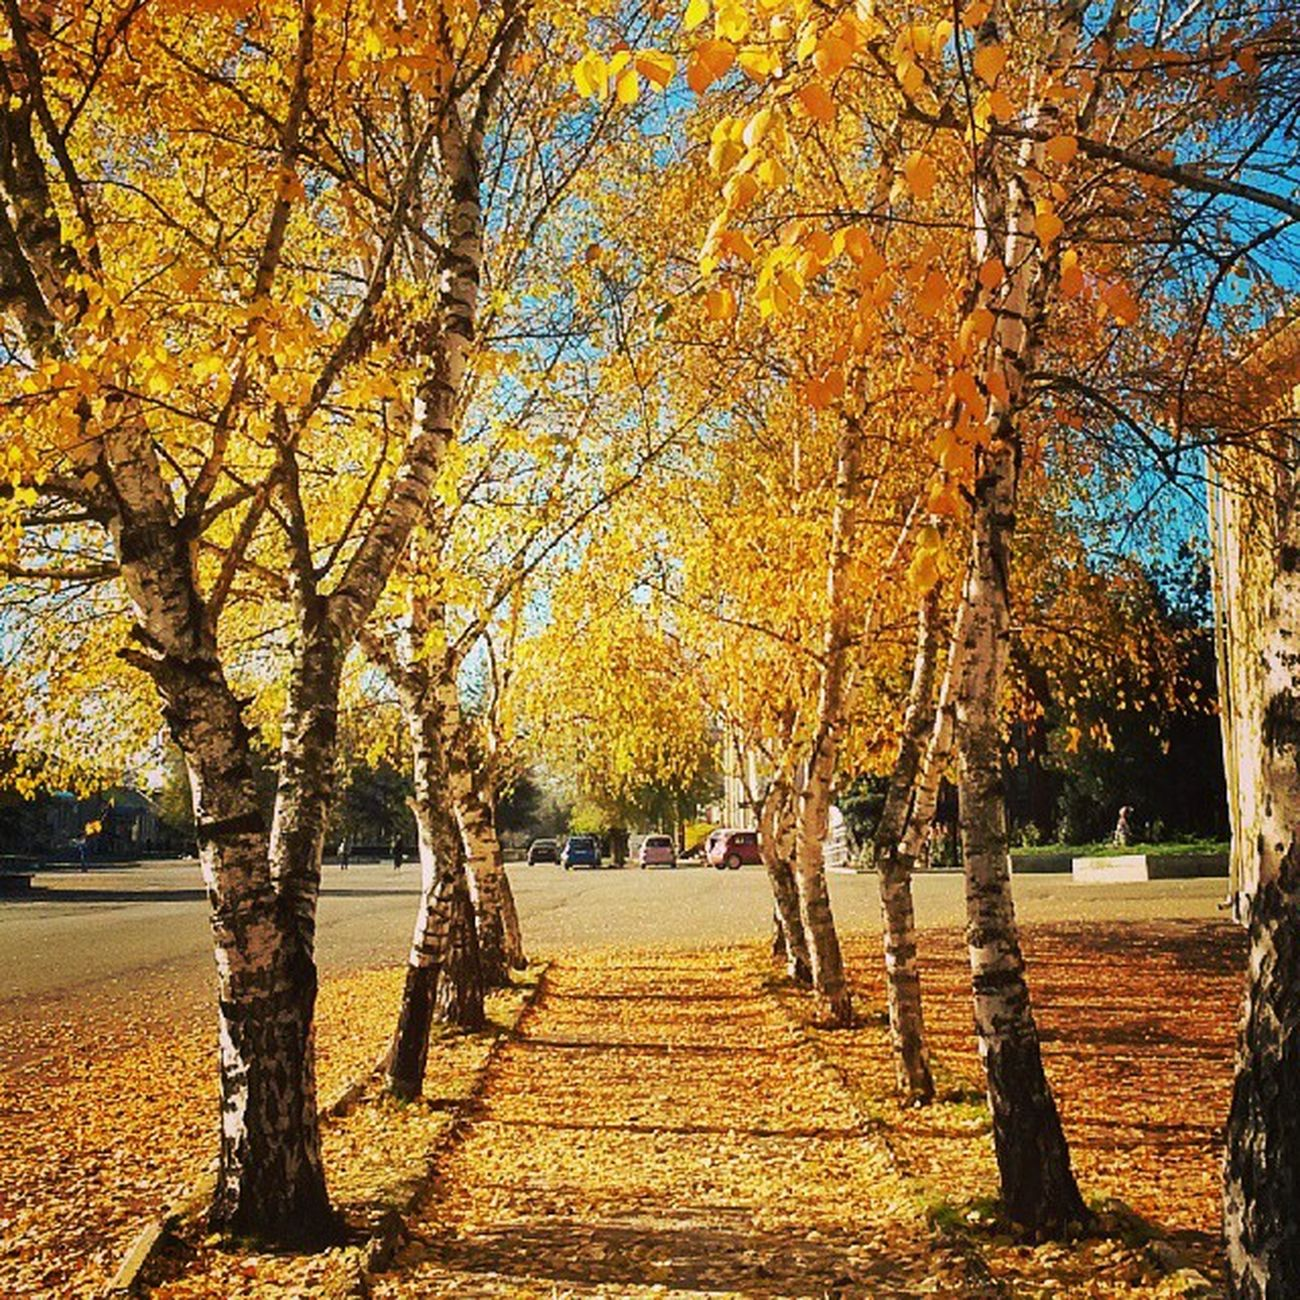 Golden Russian autumn. Fall Autumn Leaves Tagsforlikes falltime season seasons instafall instagood TFLers instaautumn photooftheday leaf foliage colorful orange red autumnweather fallweather nature Russia